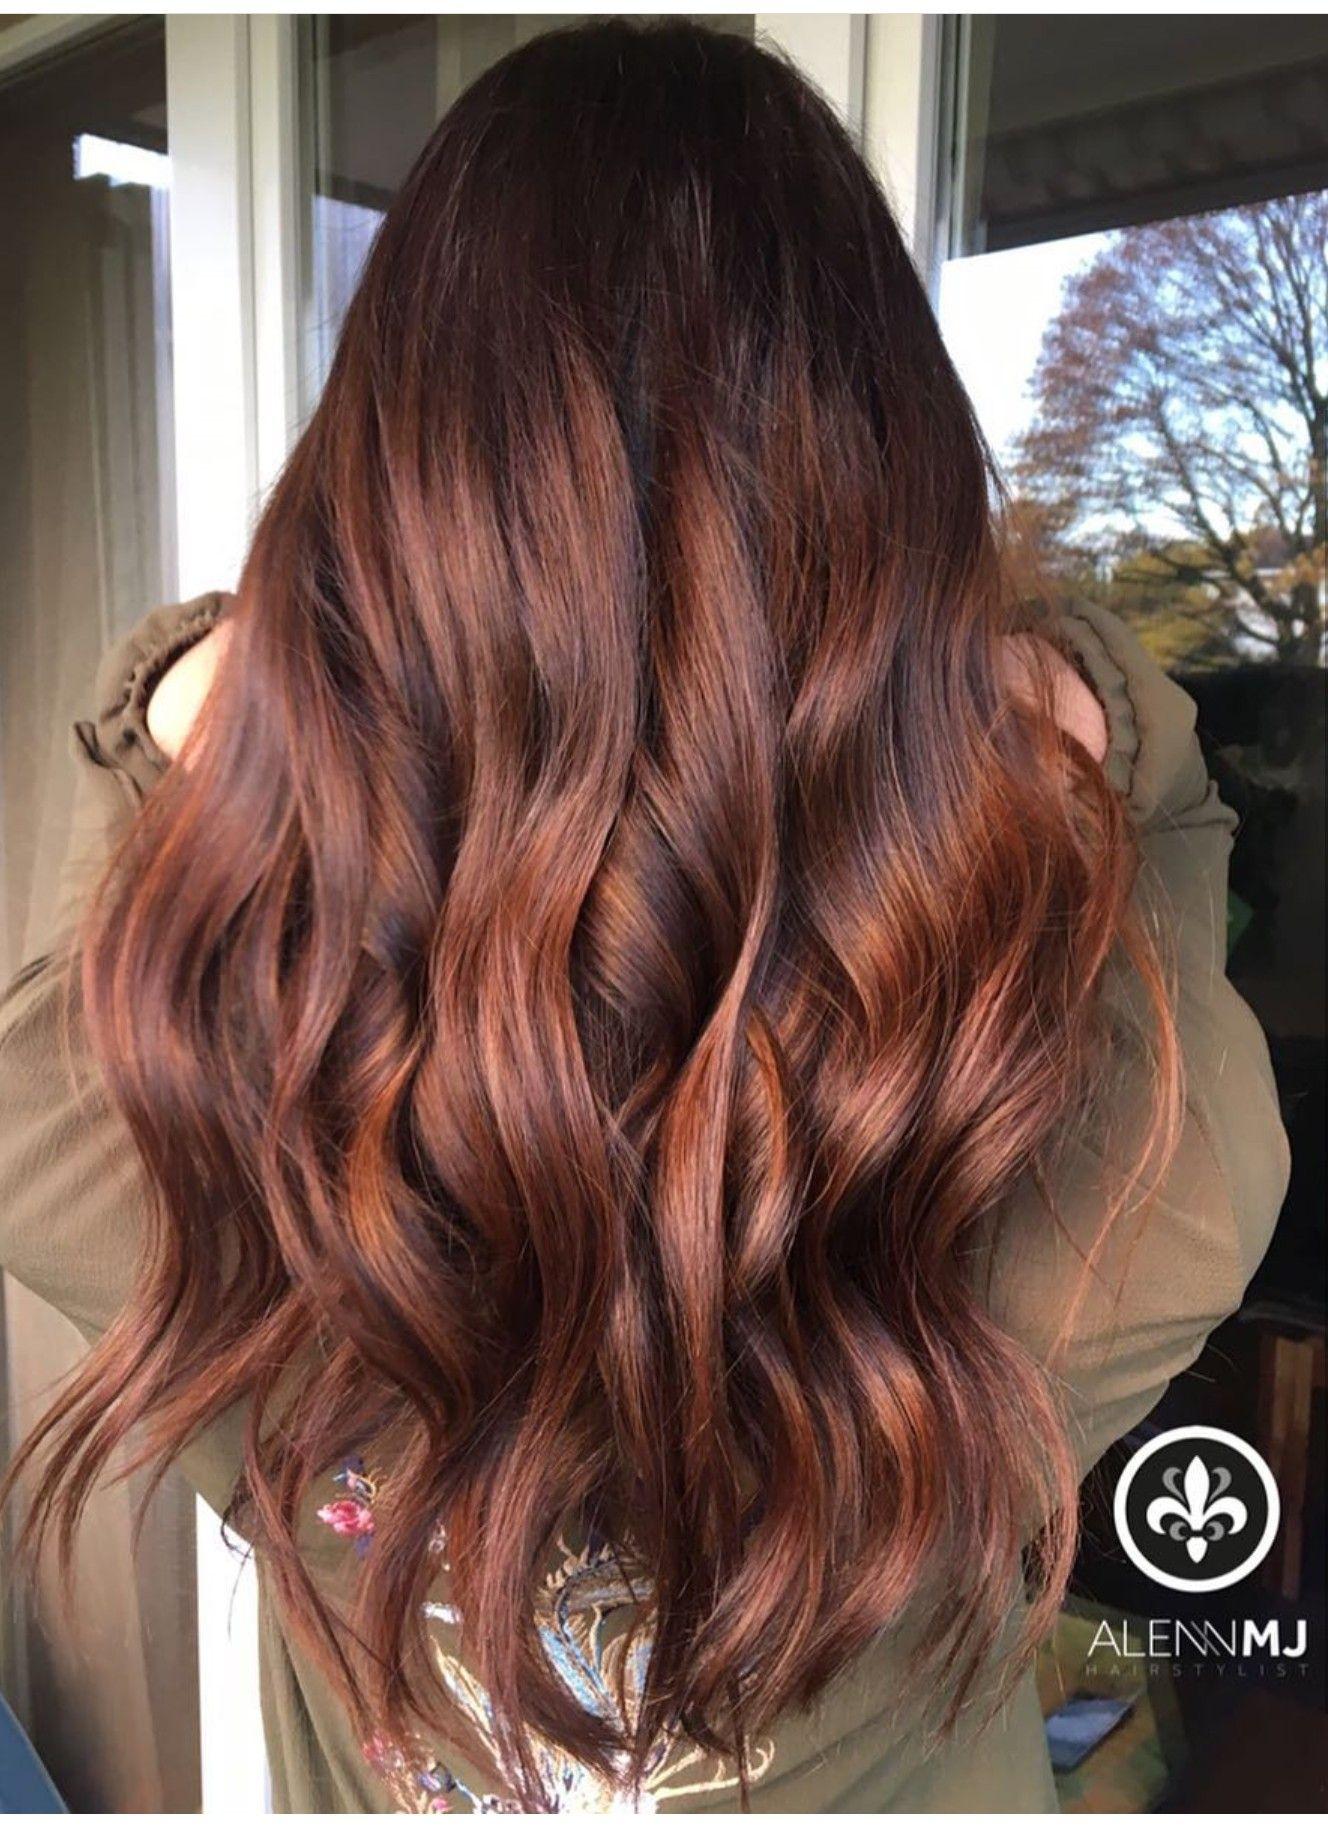 Pin By Lauren Maddison On Hair Pinterest Hair Auburn Hair And